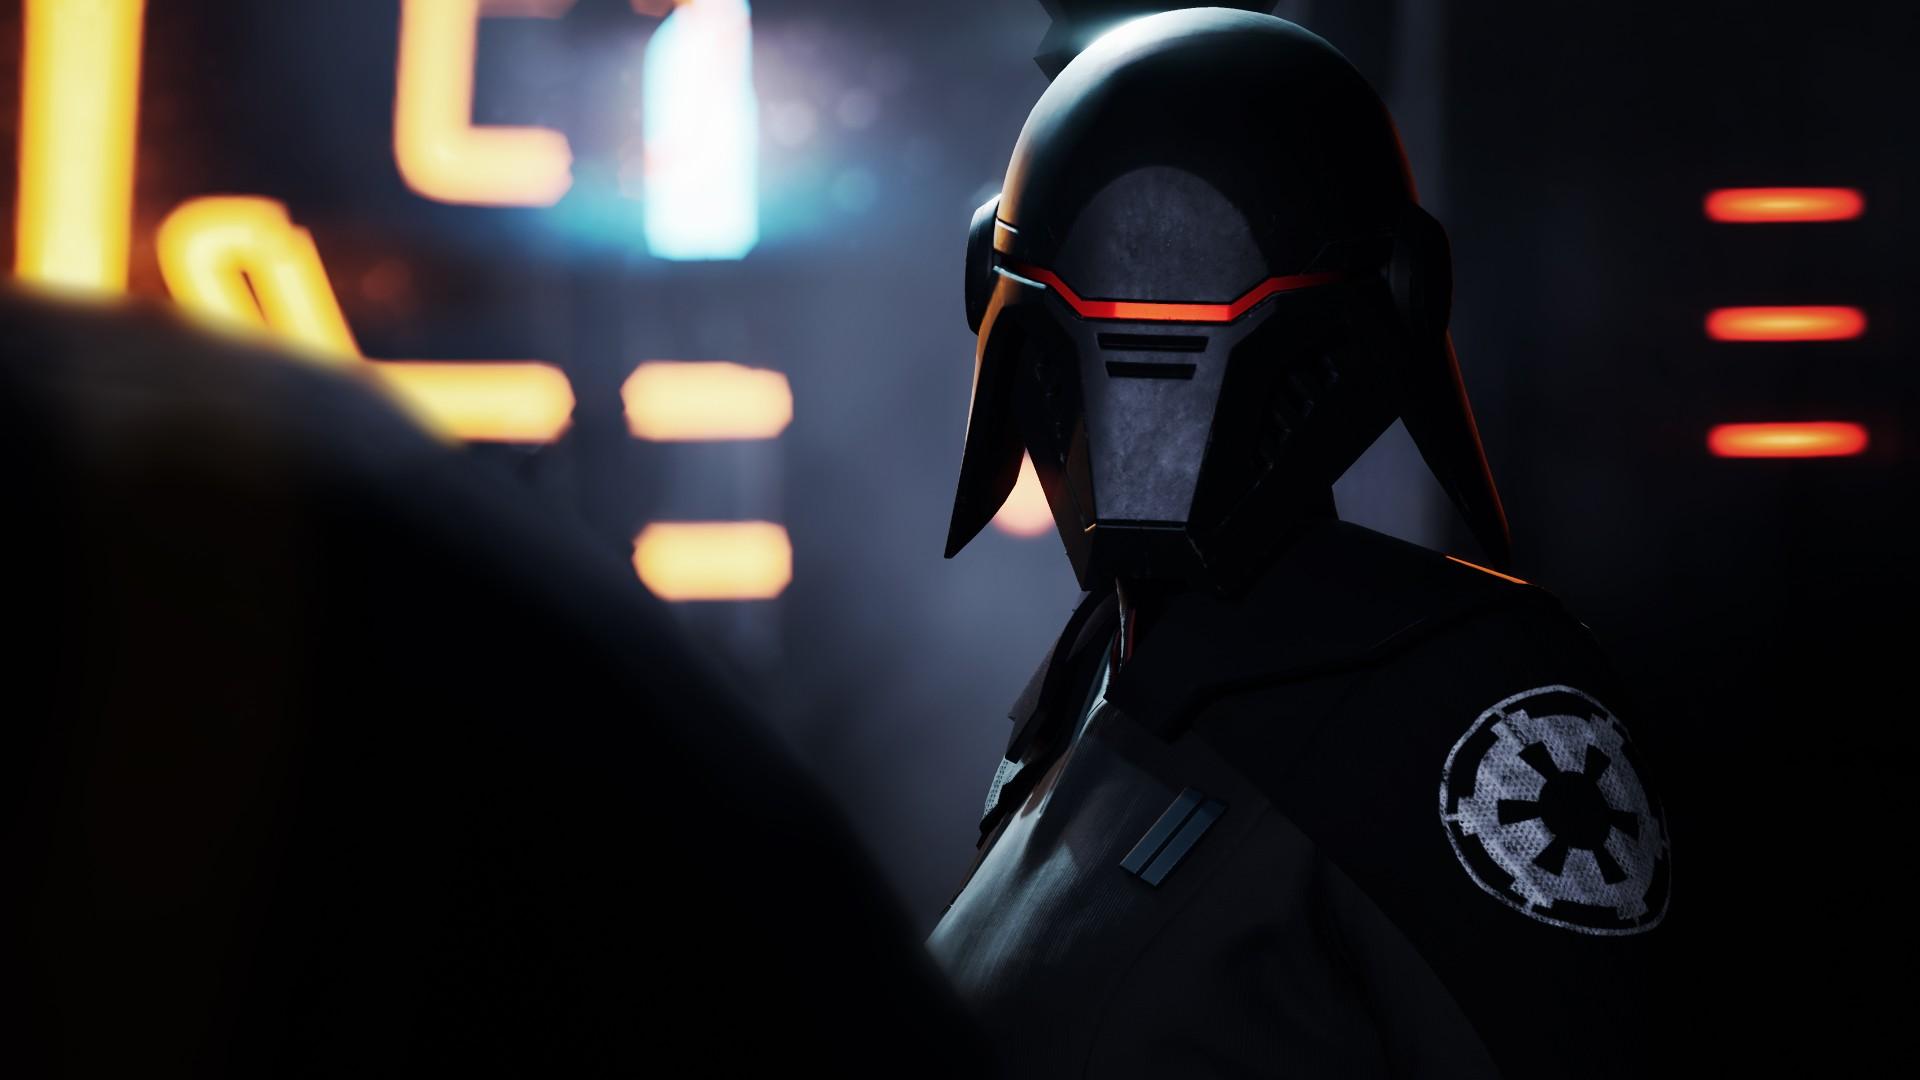 Star Wars Jedi Fallen Order Collector's Edition